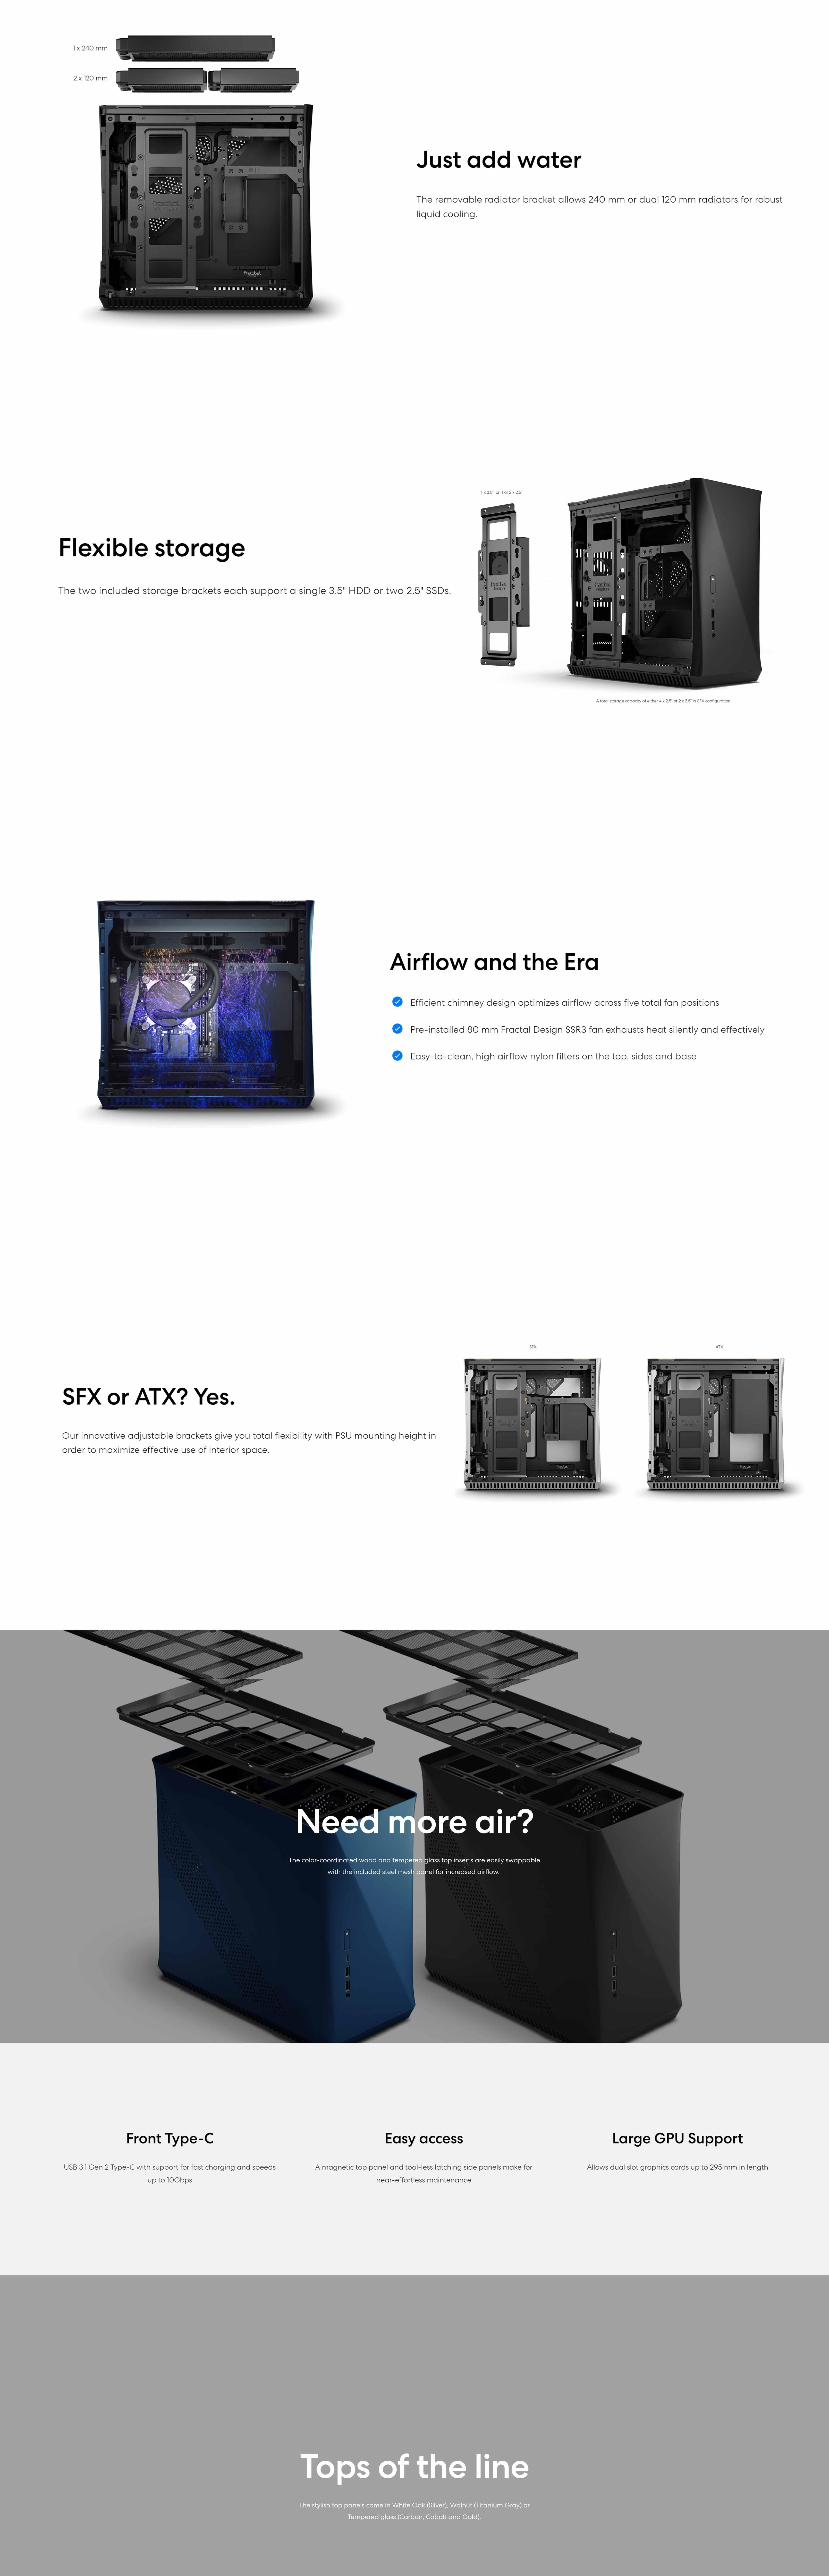 screencapture-fractal-design-products-cases-era-era-itx-cobalt-tempered-glass-2020-05-22-18_45_01.jpg